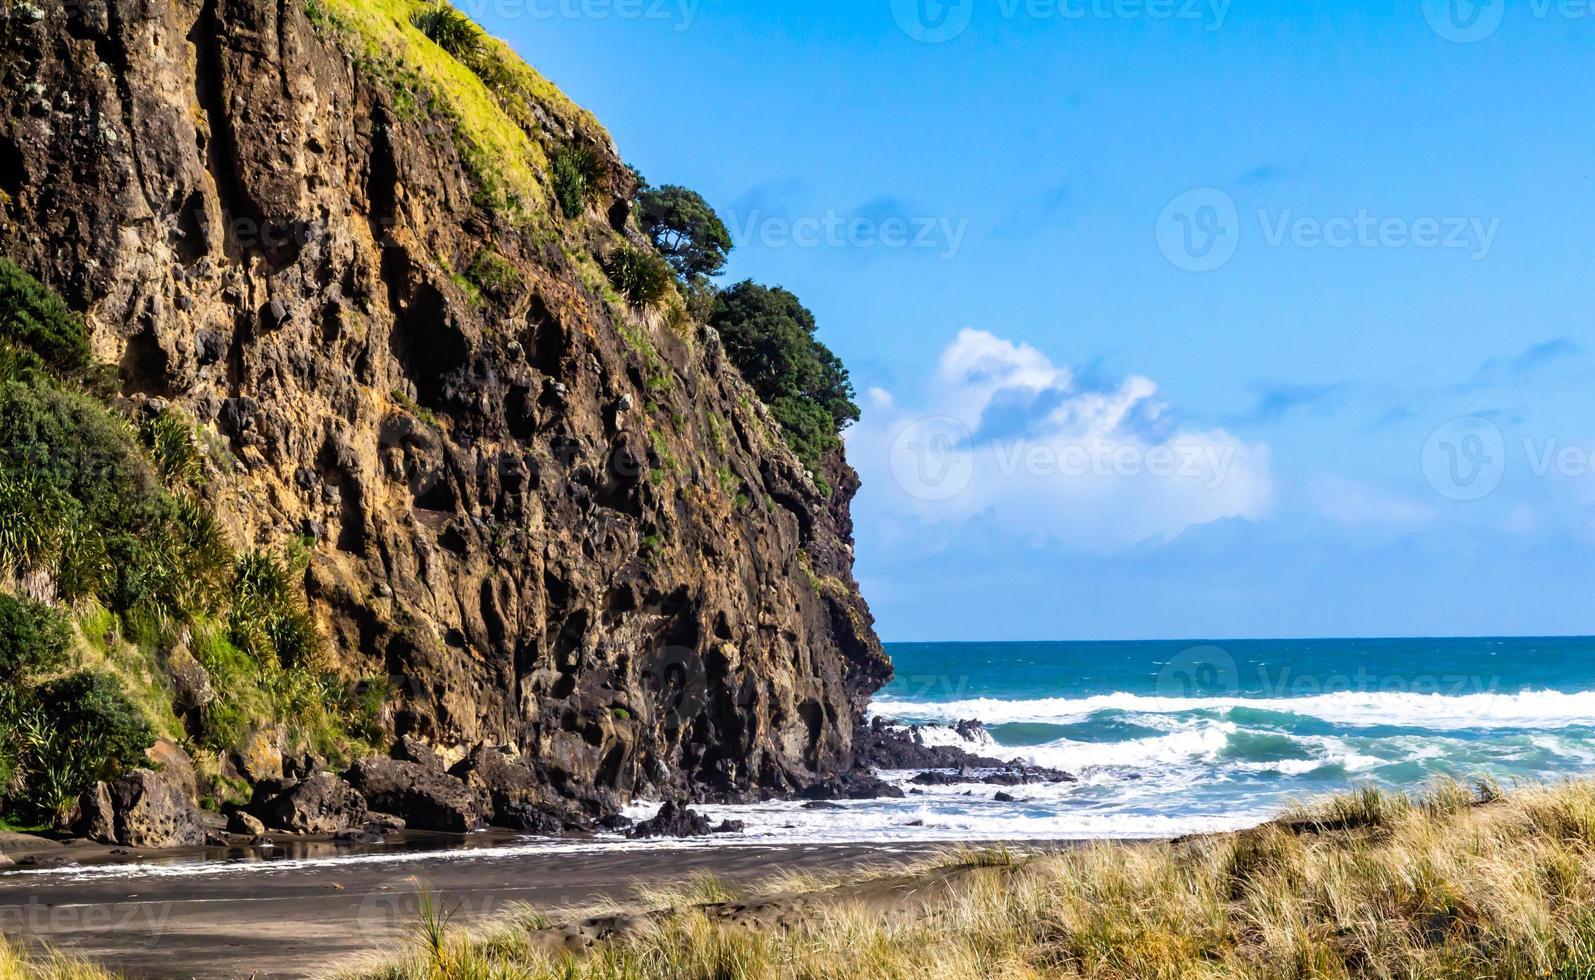 Sandy beaches of Piha Beach, Auckland, New Zealand photo